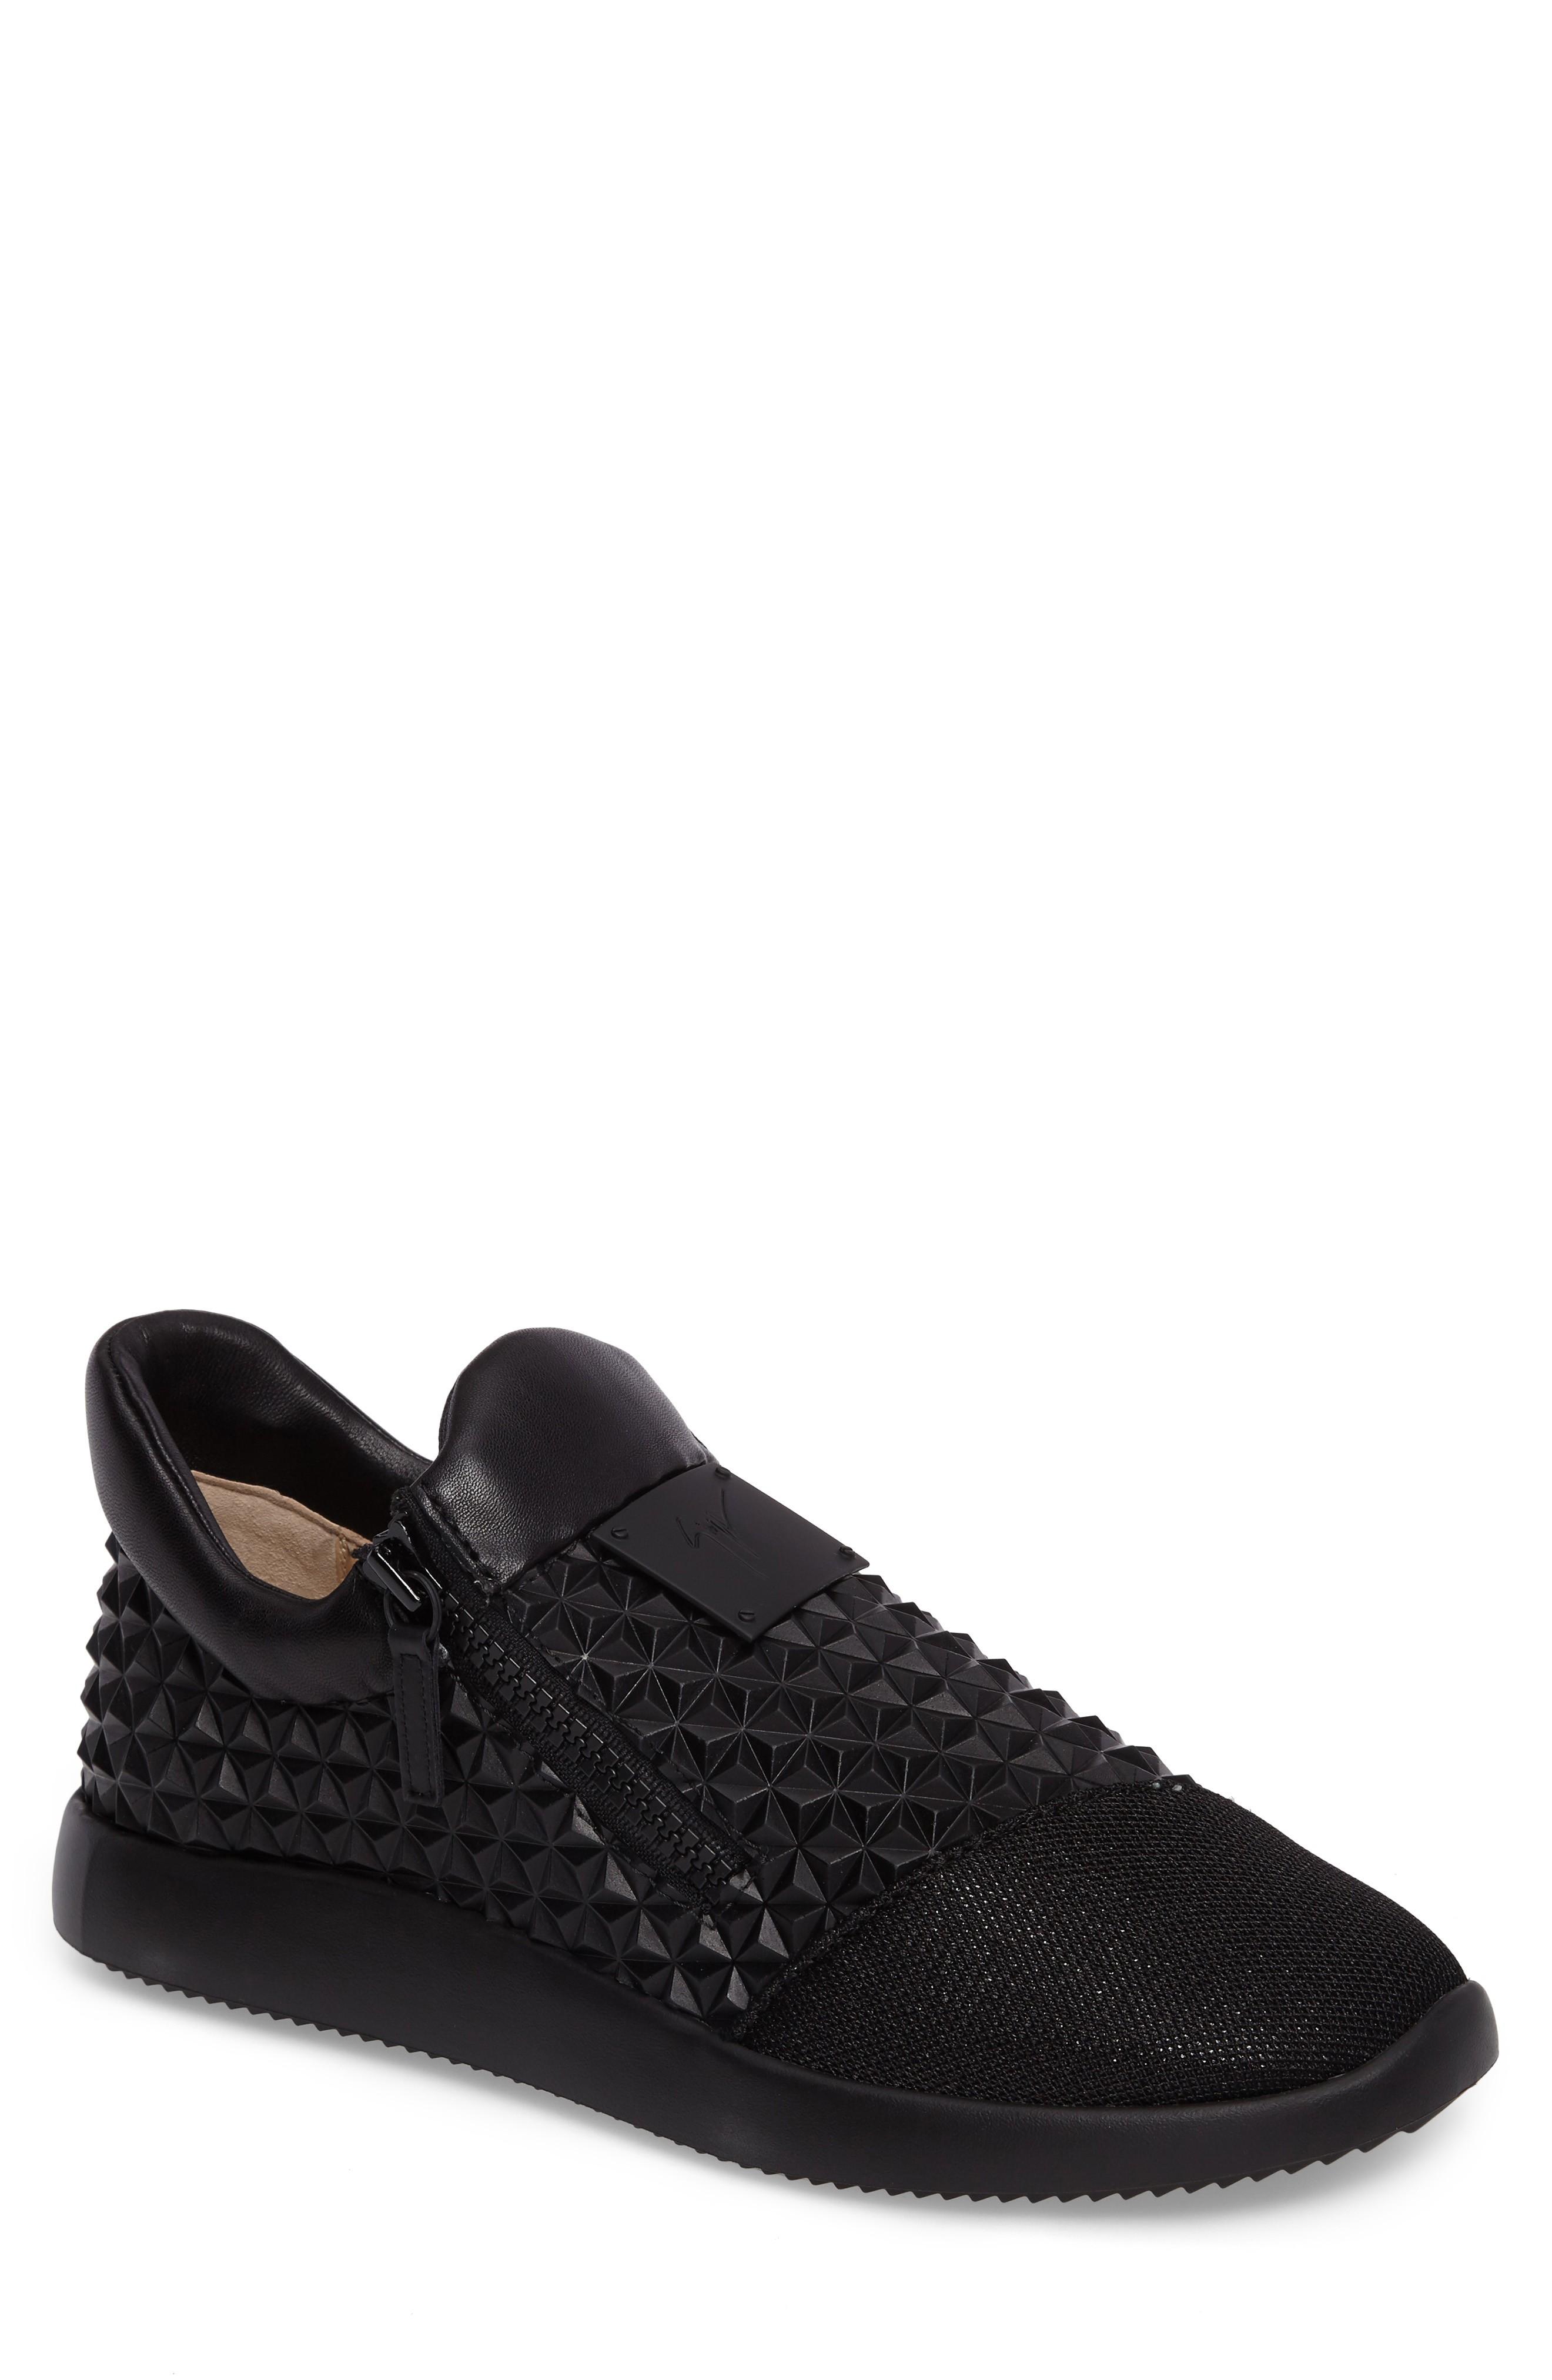 2640x4048 Men's Dress Sneakers, Athletic Amp Tennis Shoes Nordstrom